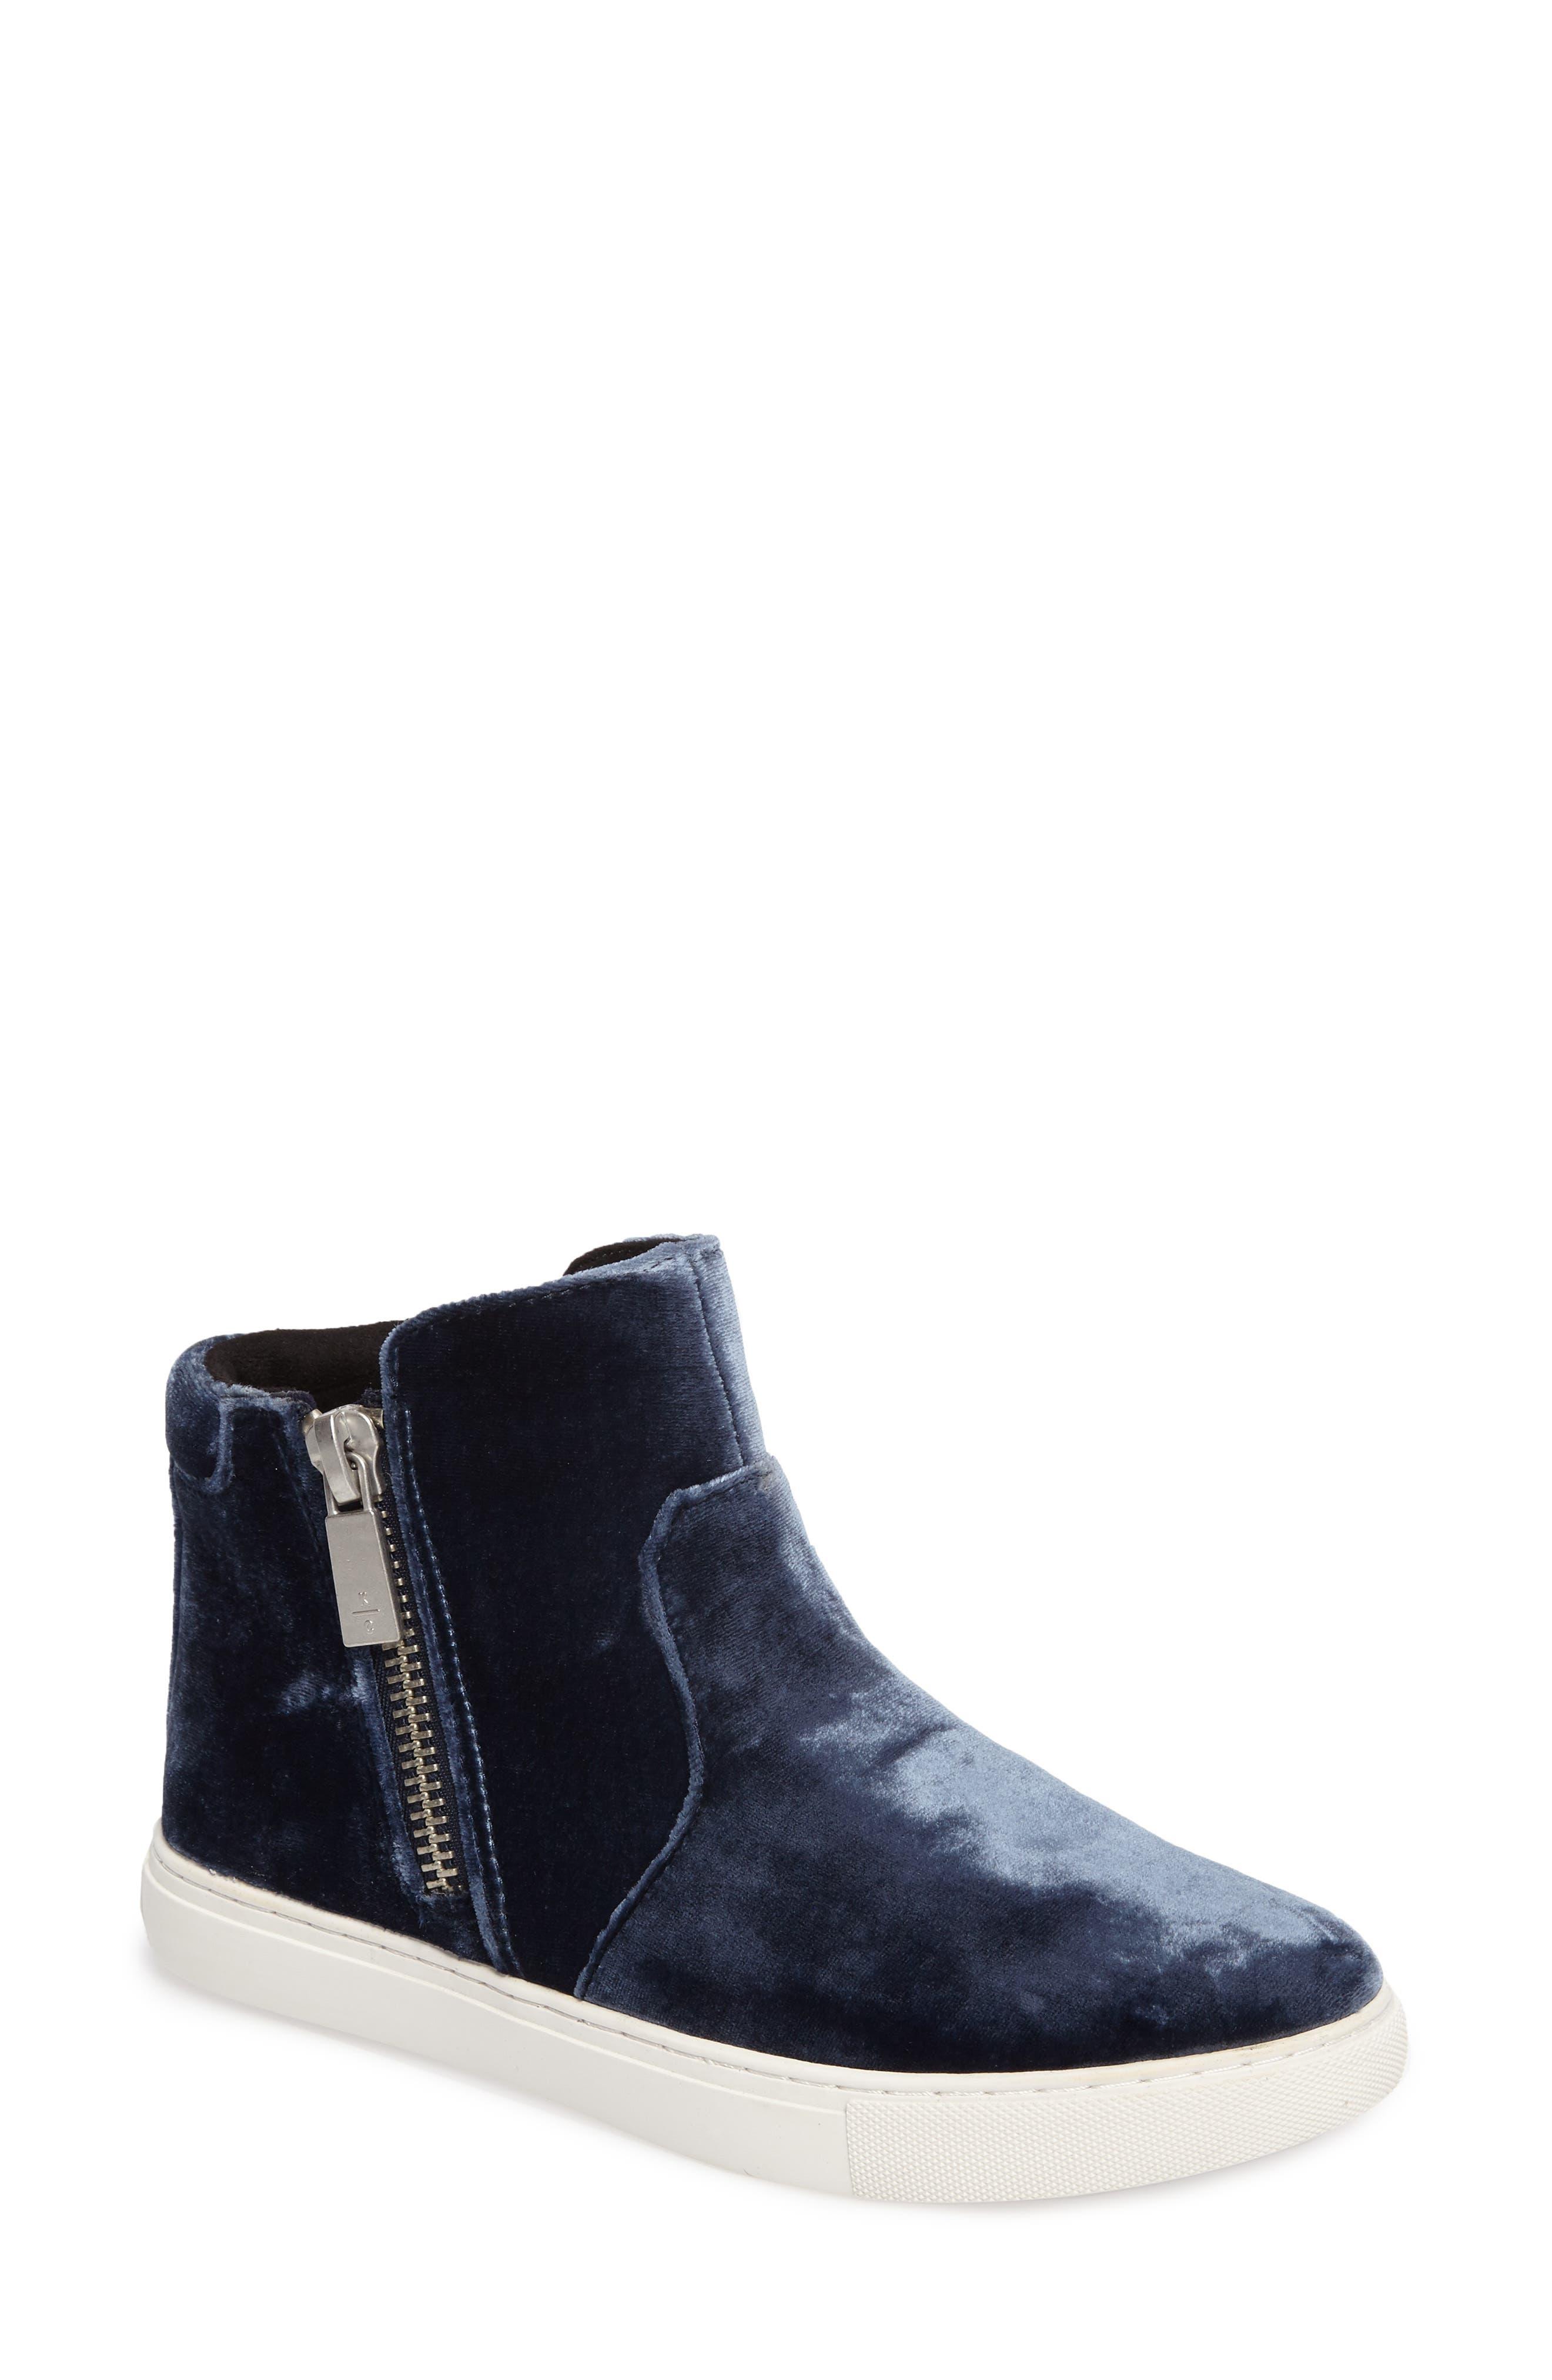 Alternate Image 1 Selected - Kenneth Cole New York 'Kiera' Zip High Top Sneaker (Women)